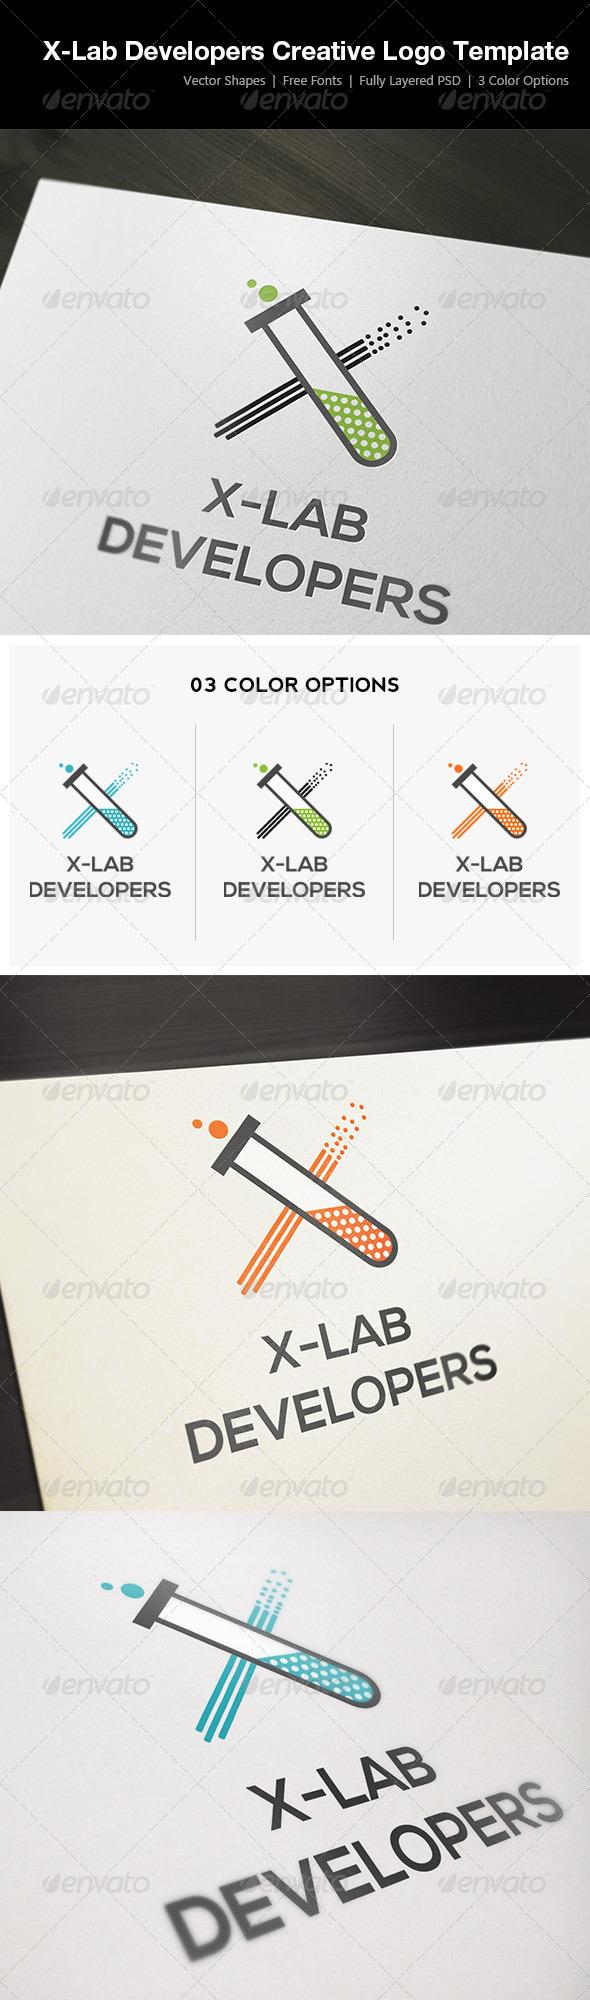 X-Lab Developers Creative Logo Template - Symbols Logo Templates